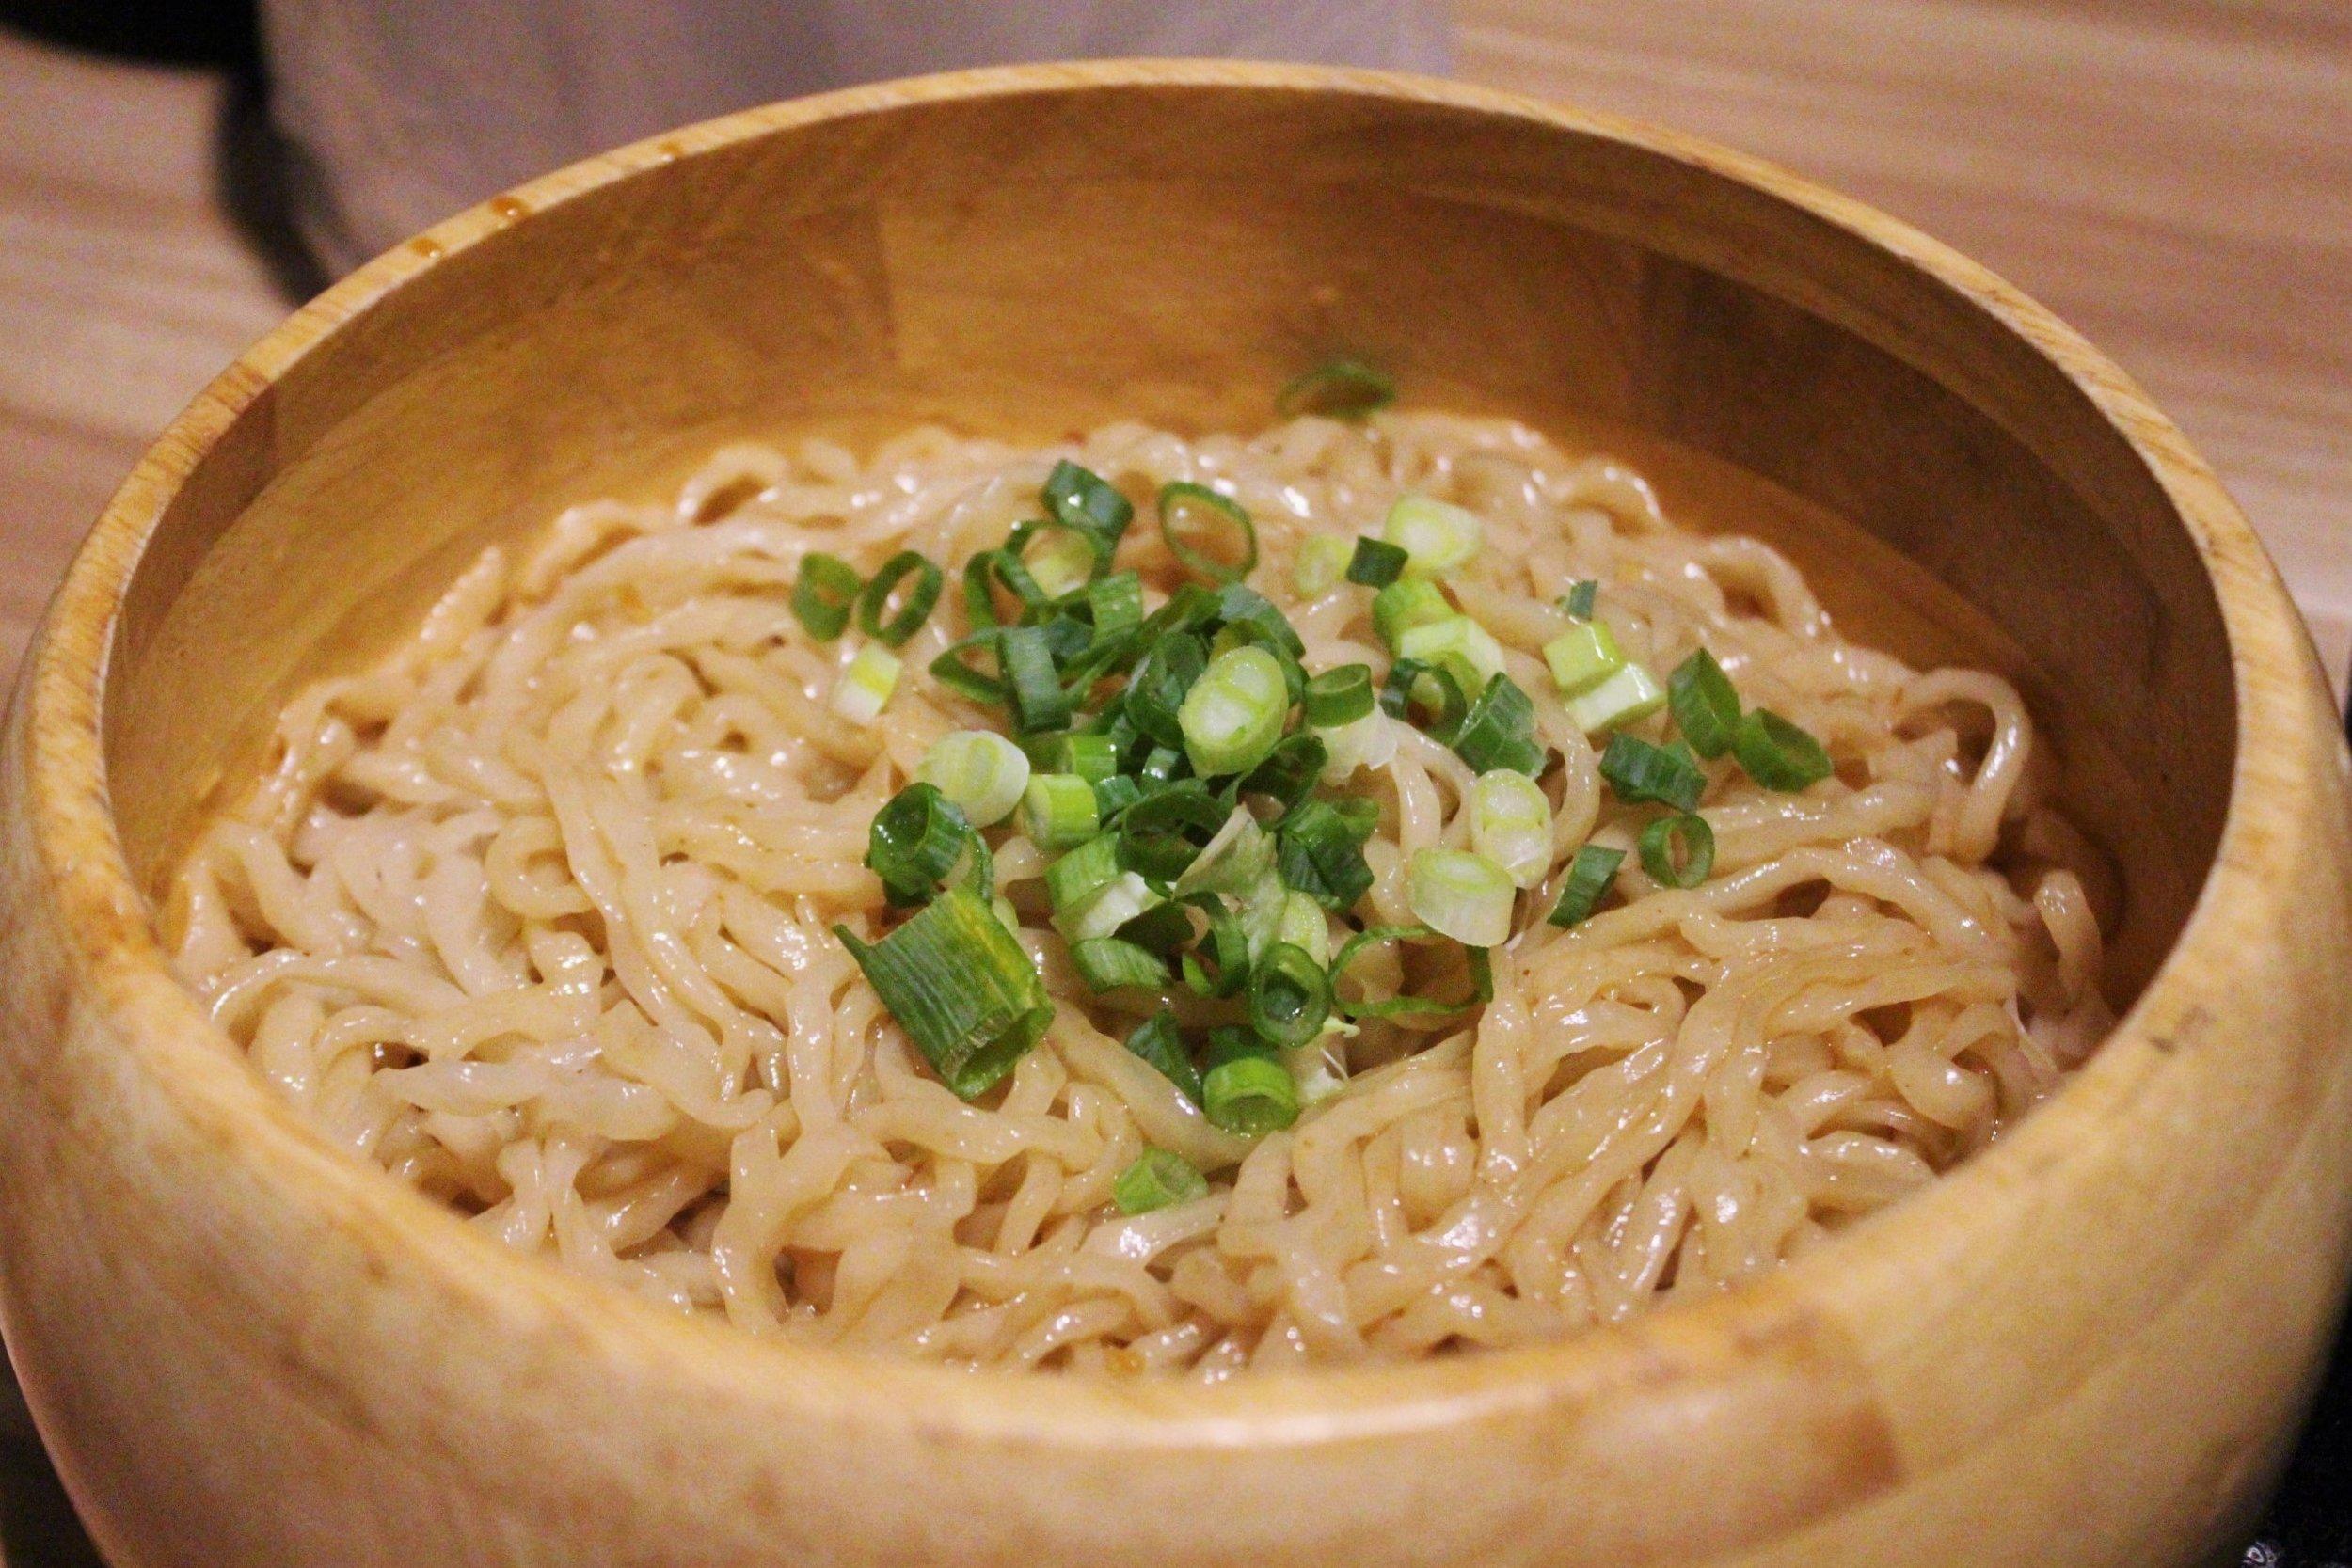 Noodles! 大師兄銷魂麵 at 大師兄麻辣鍋物 in Taiwan